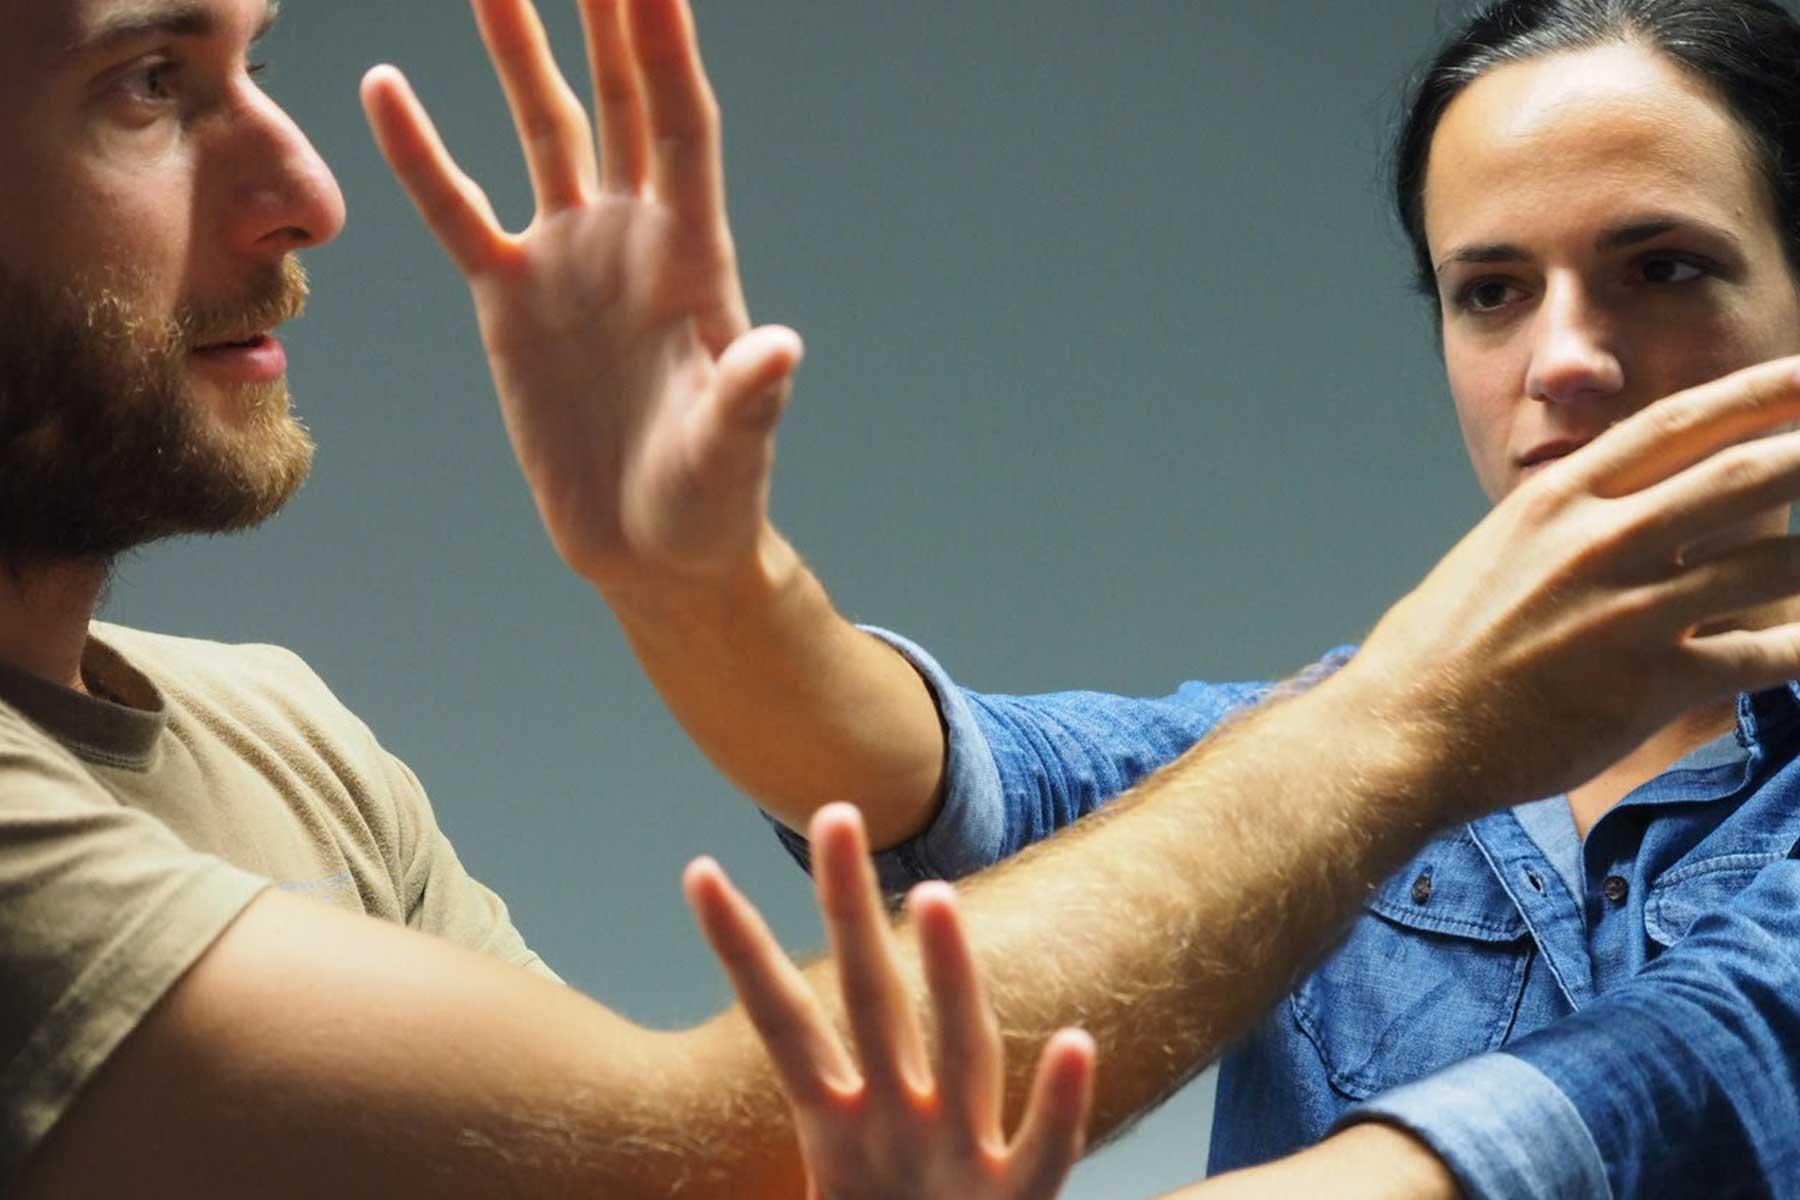 TIAGO RODRIGUES / TNDMII - Antony and Cleopatra